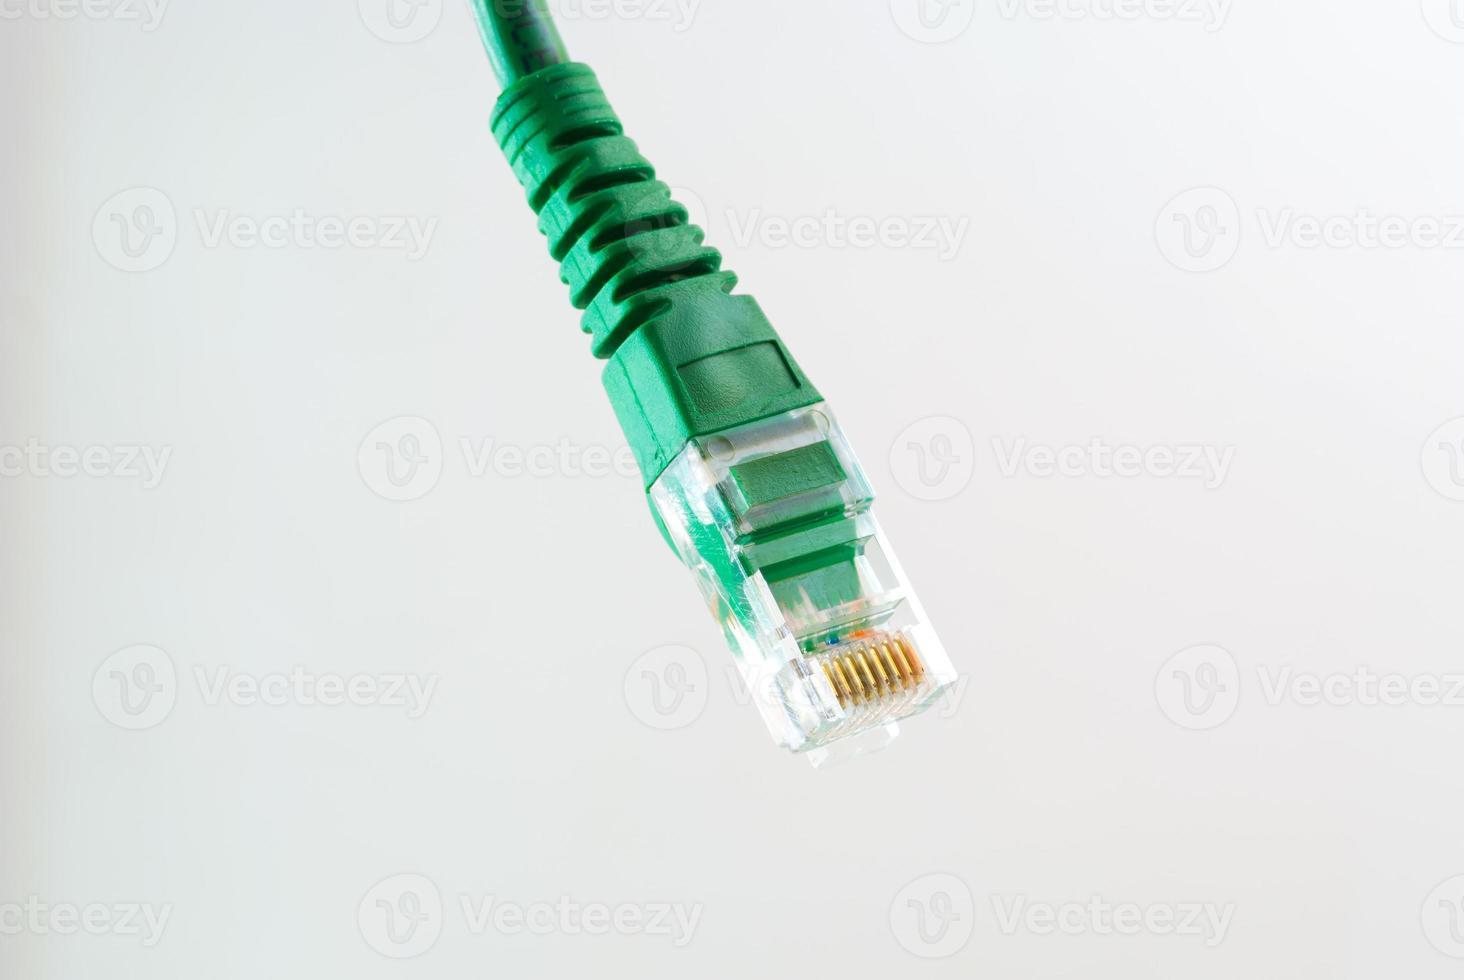 netwerkkabel rj45 hoofd op witte achtergrond foto